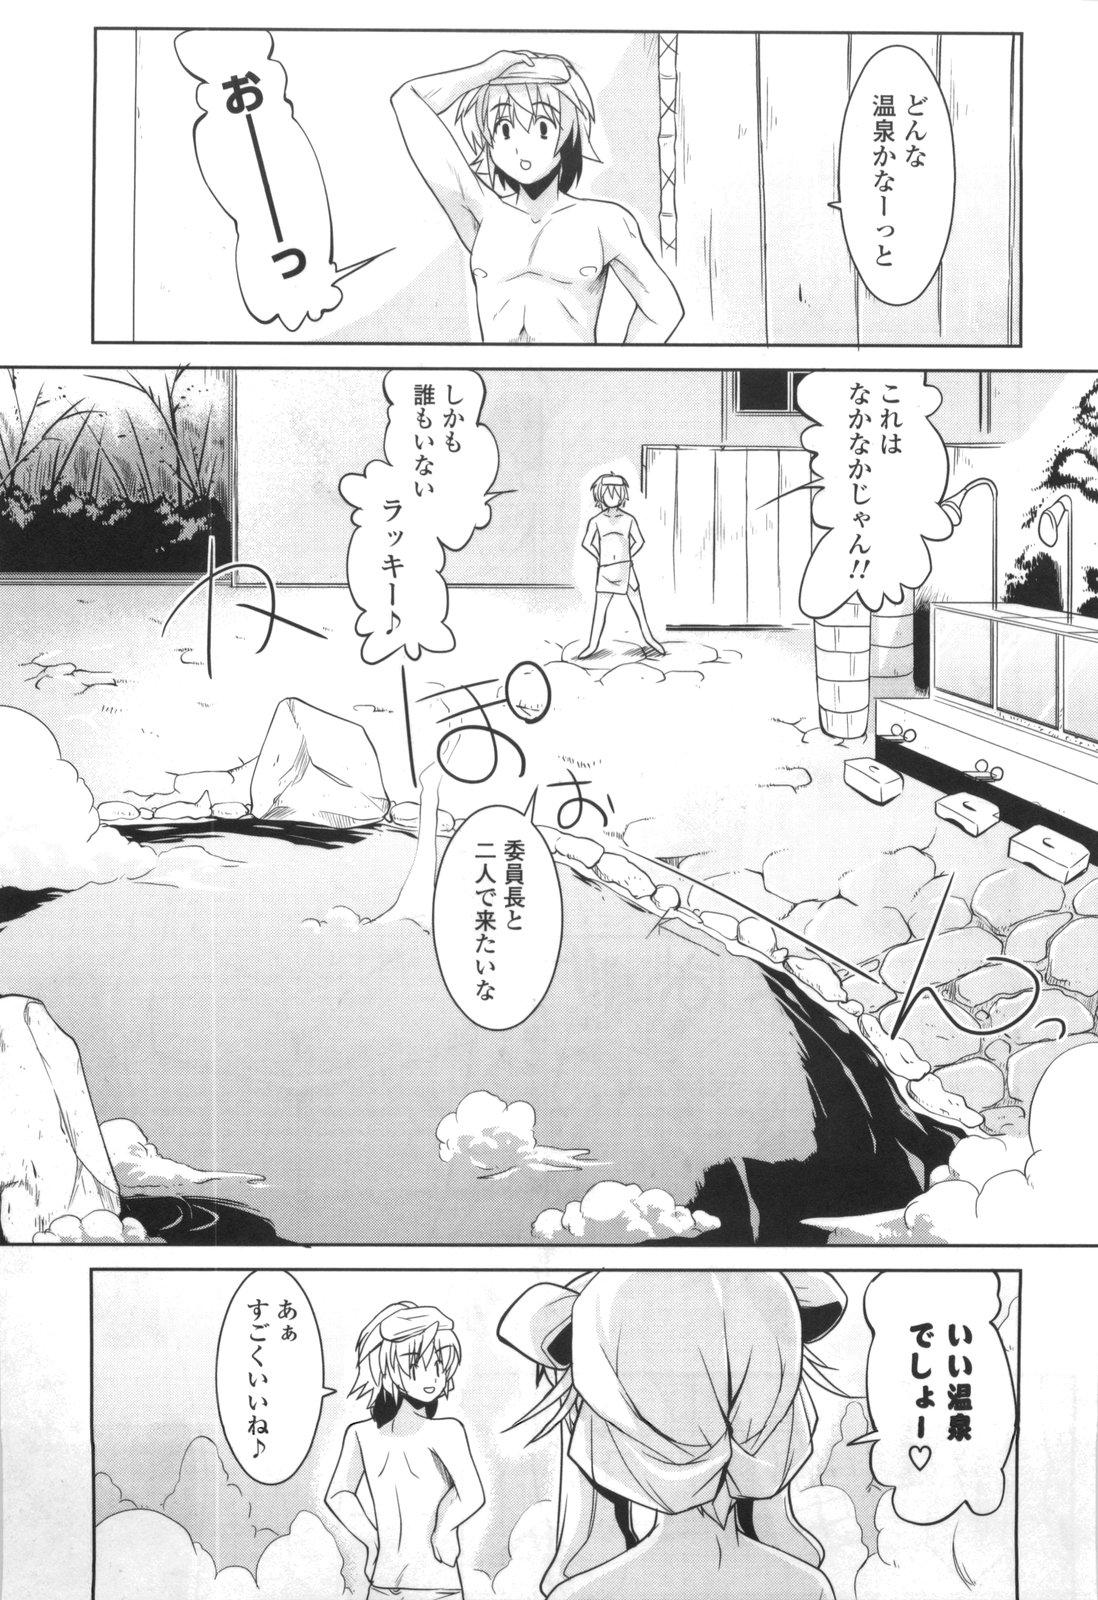 [Gyonikun] Gosyujin-sama Senyou!? Ami-sama Senyou 154